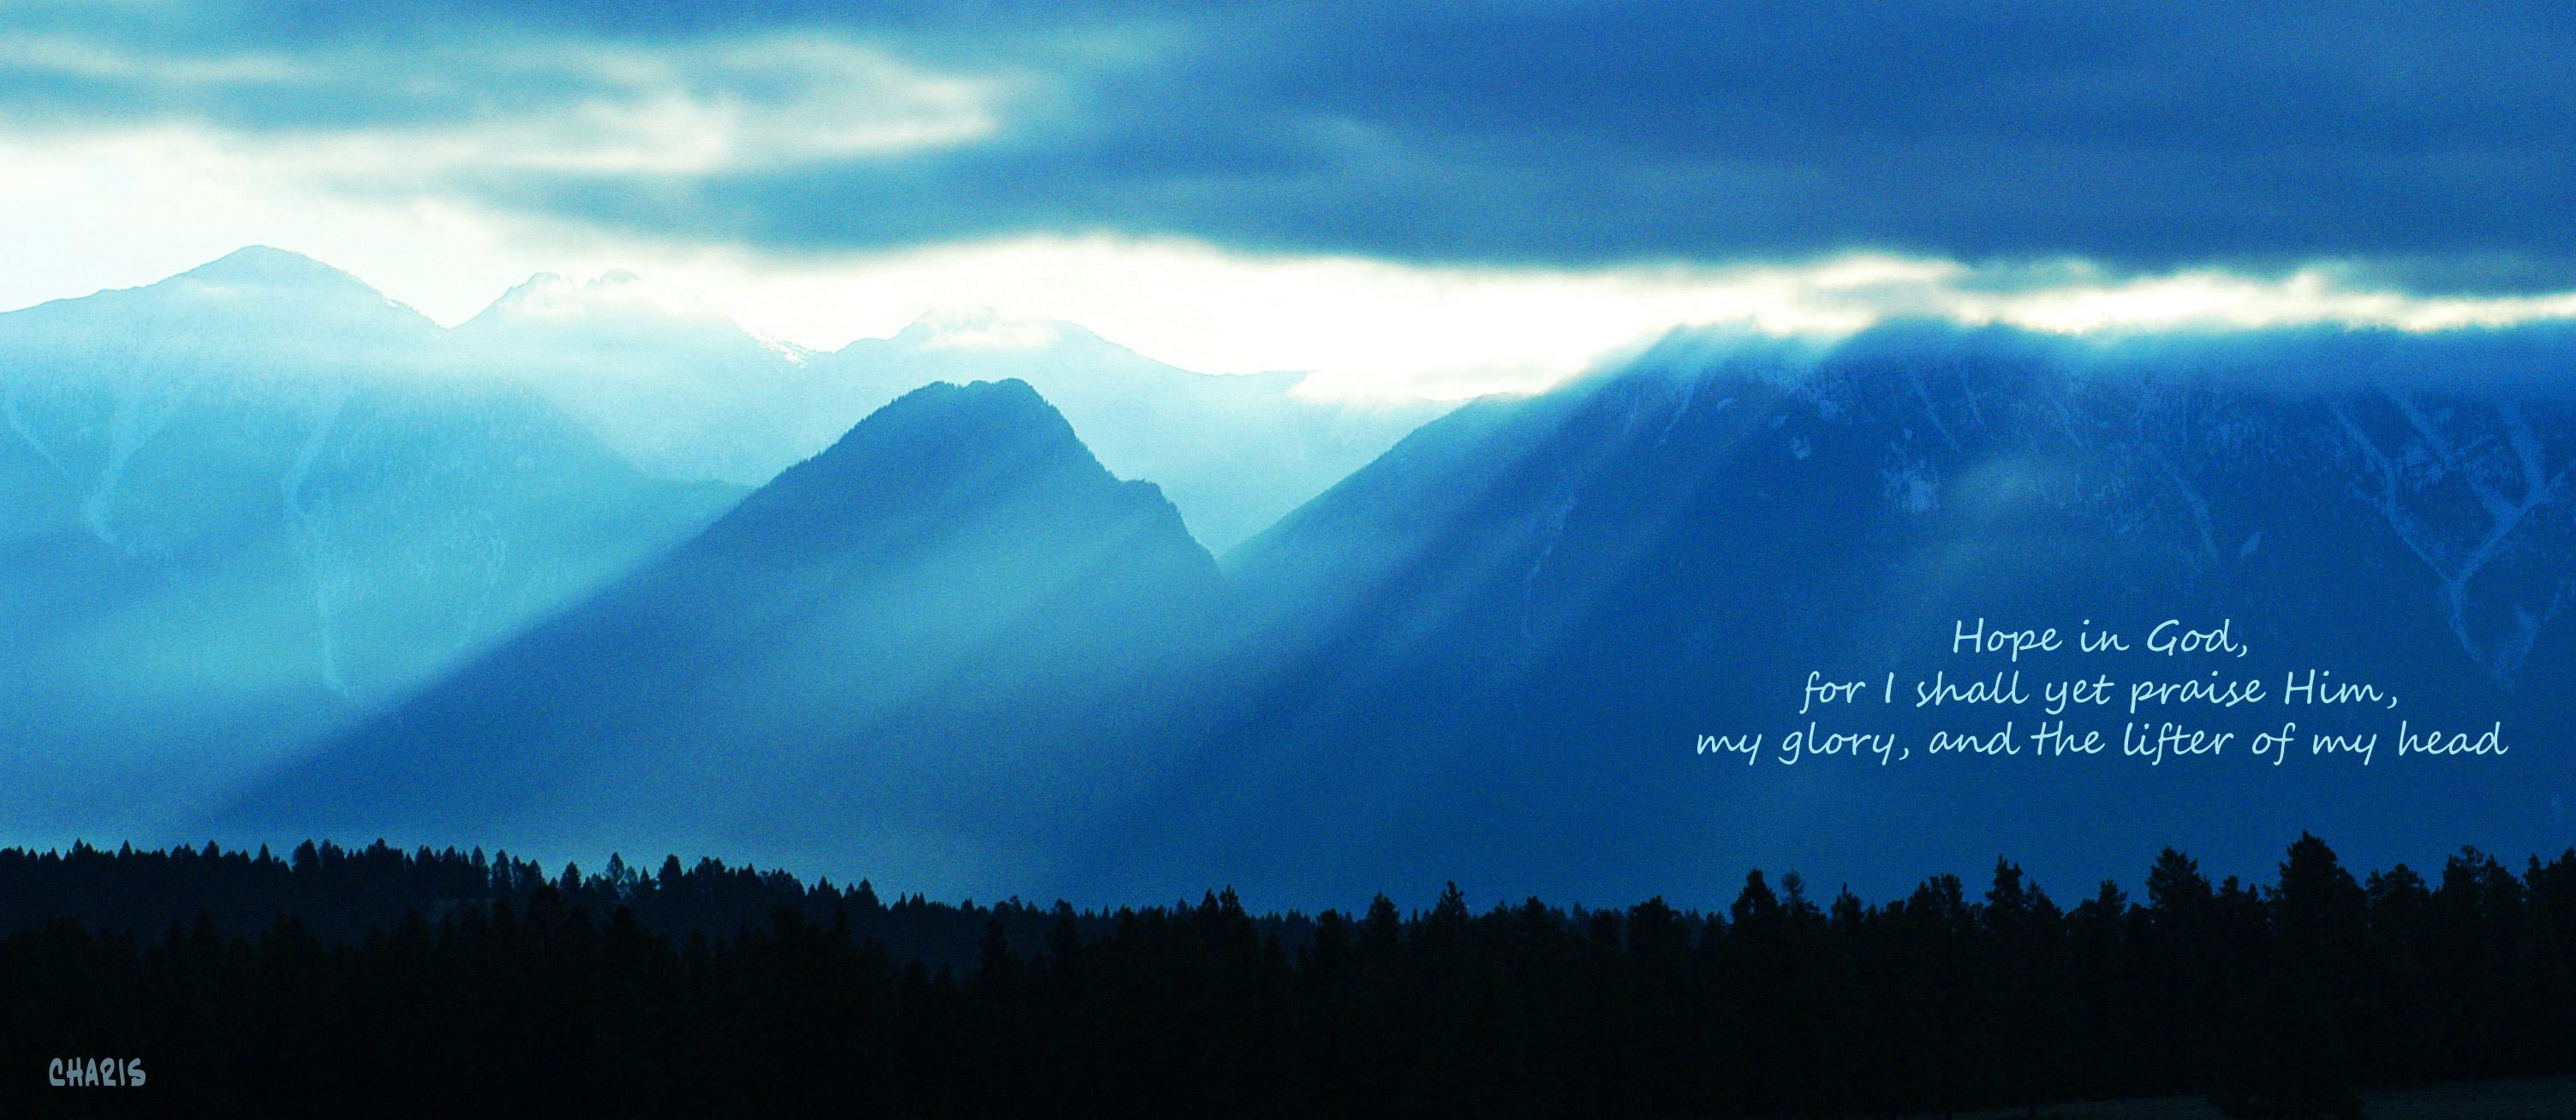 hope in god steeplerays blue charis